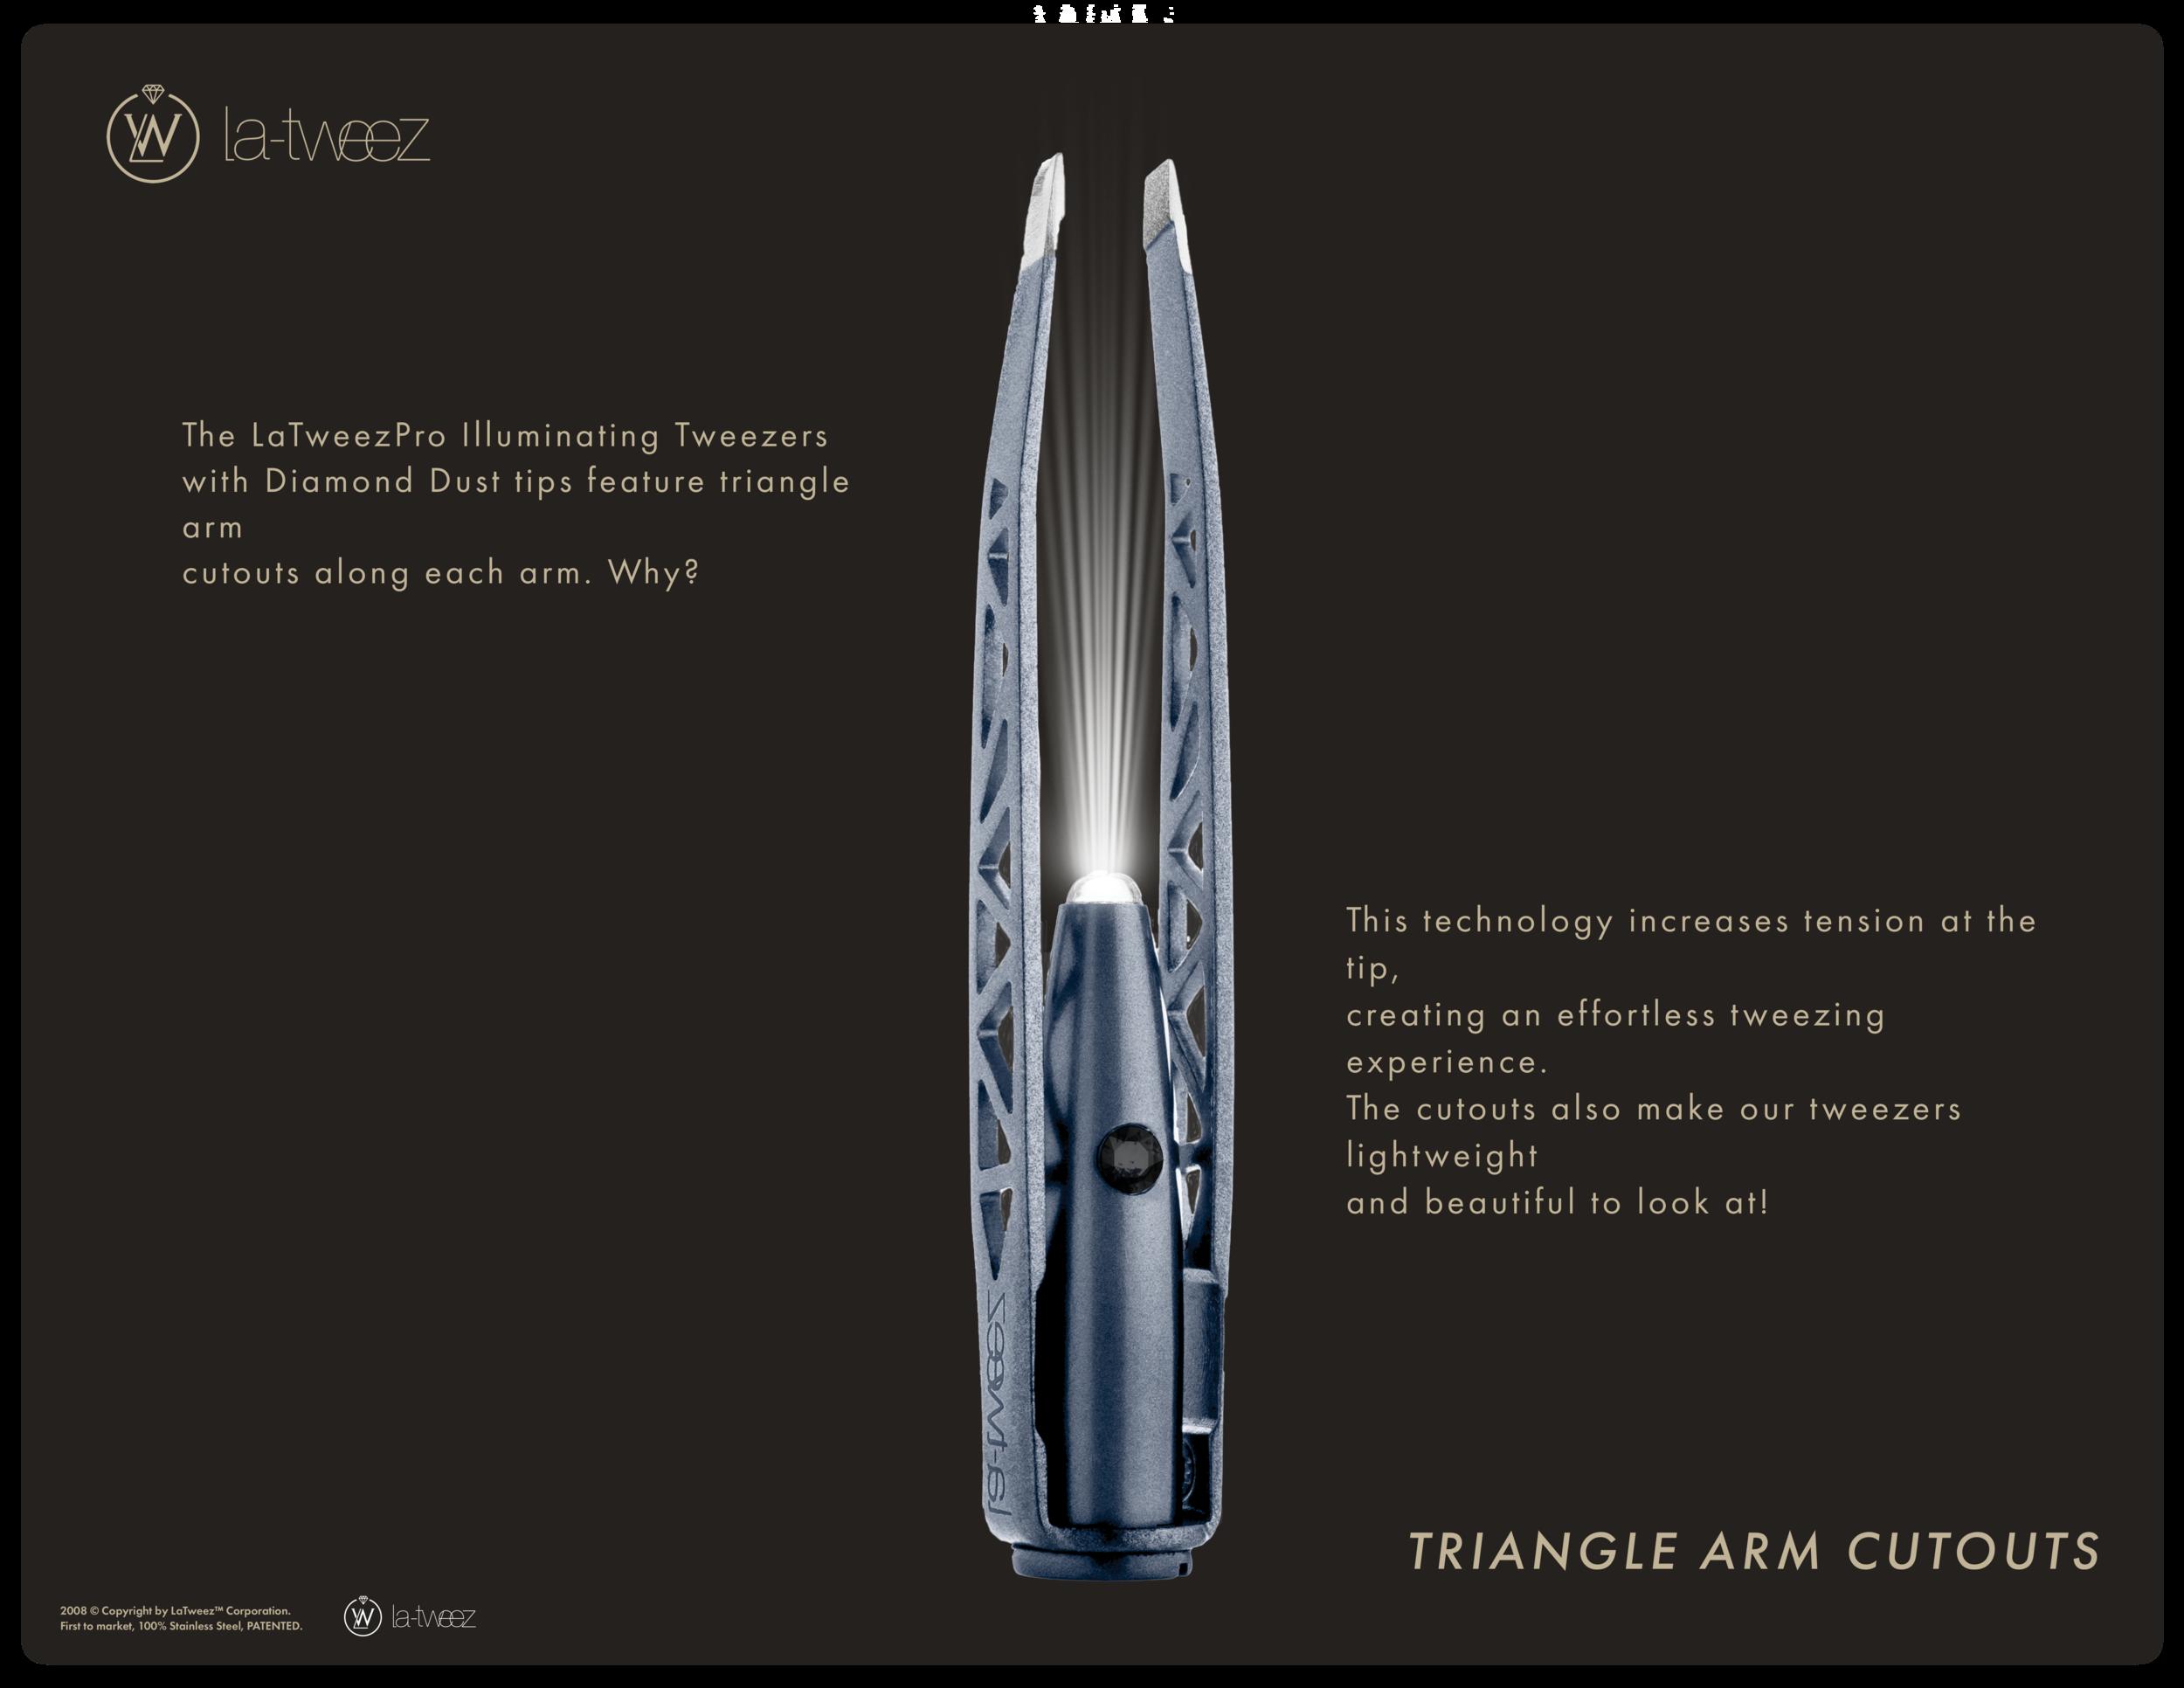 Triangle Arm Cutouts